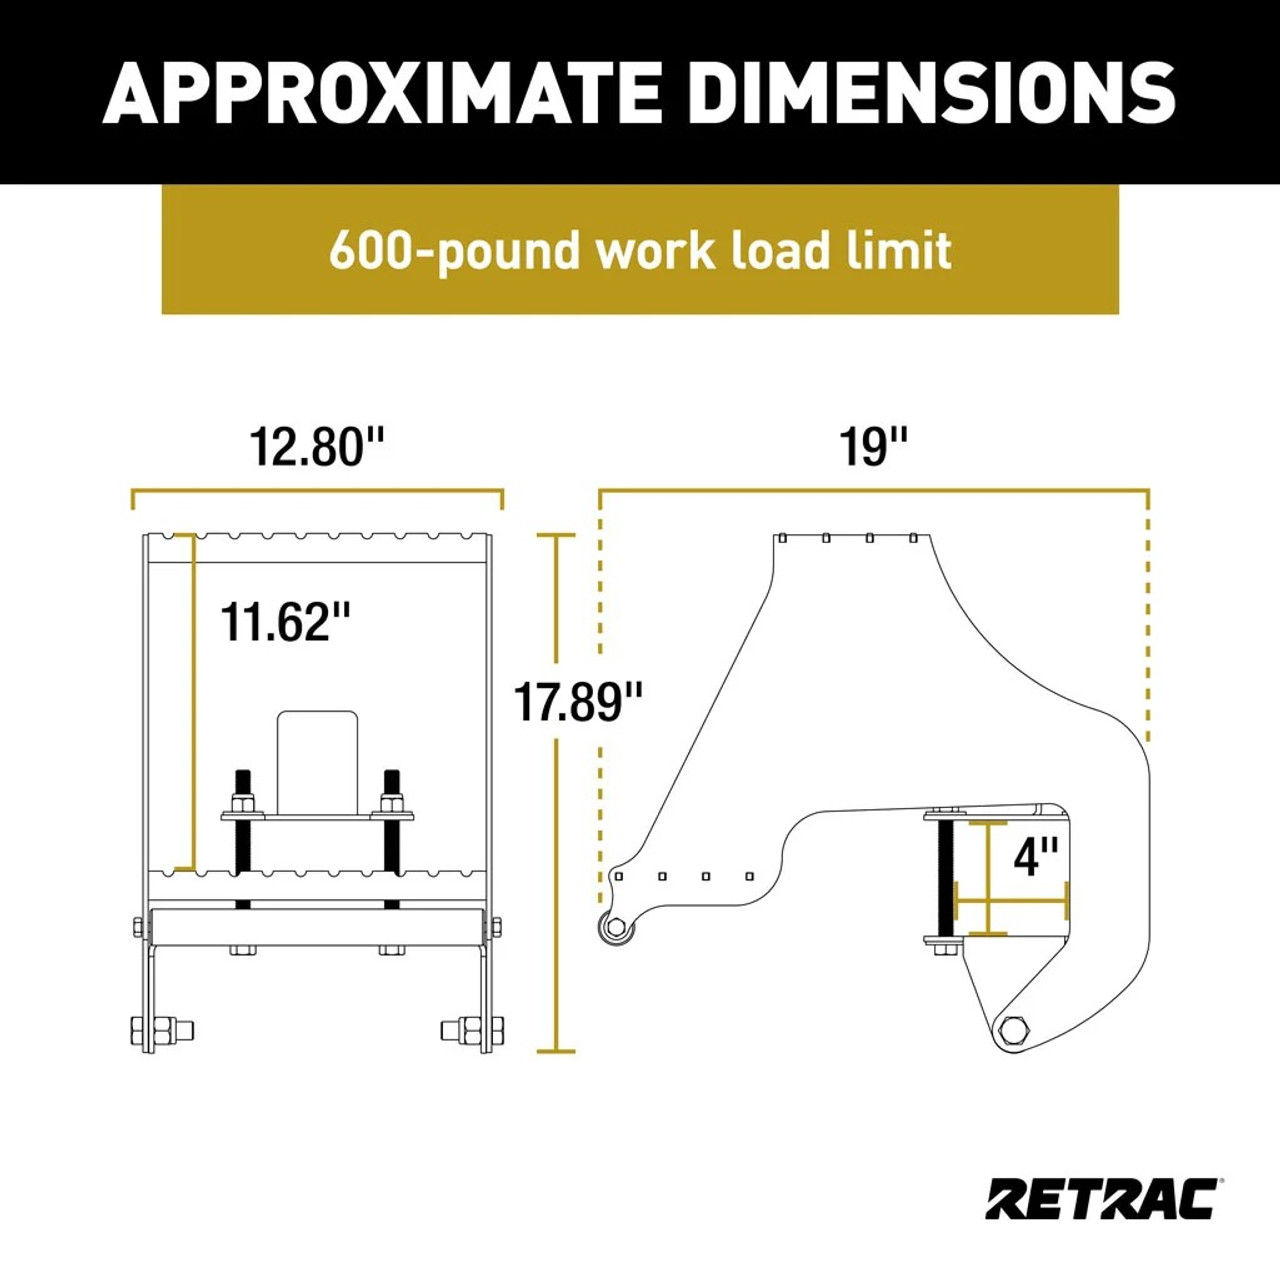 RETRAC / RET 409924 / The HighRise™ Folding Rear Entry Step Assist